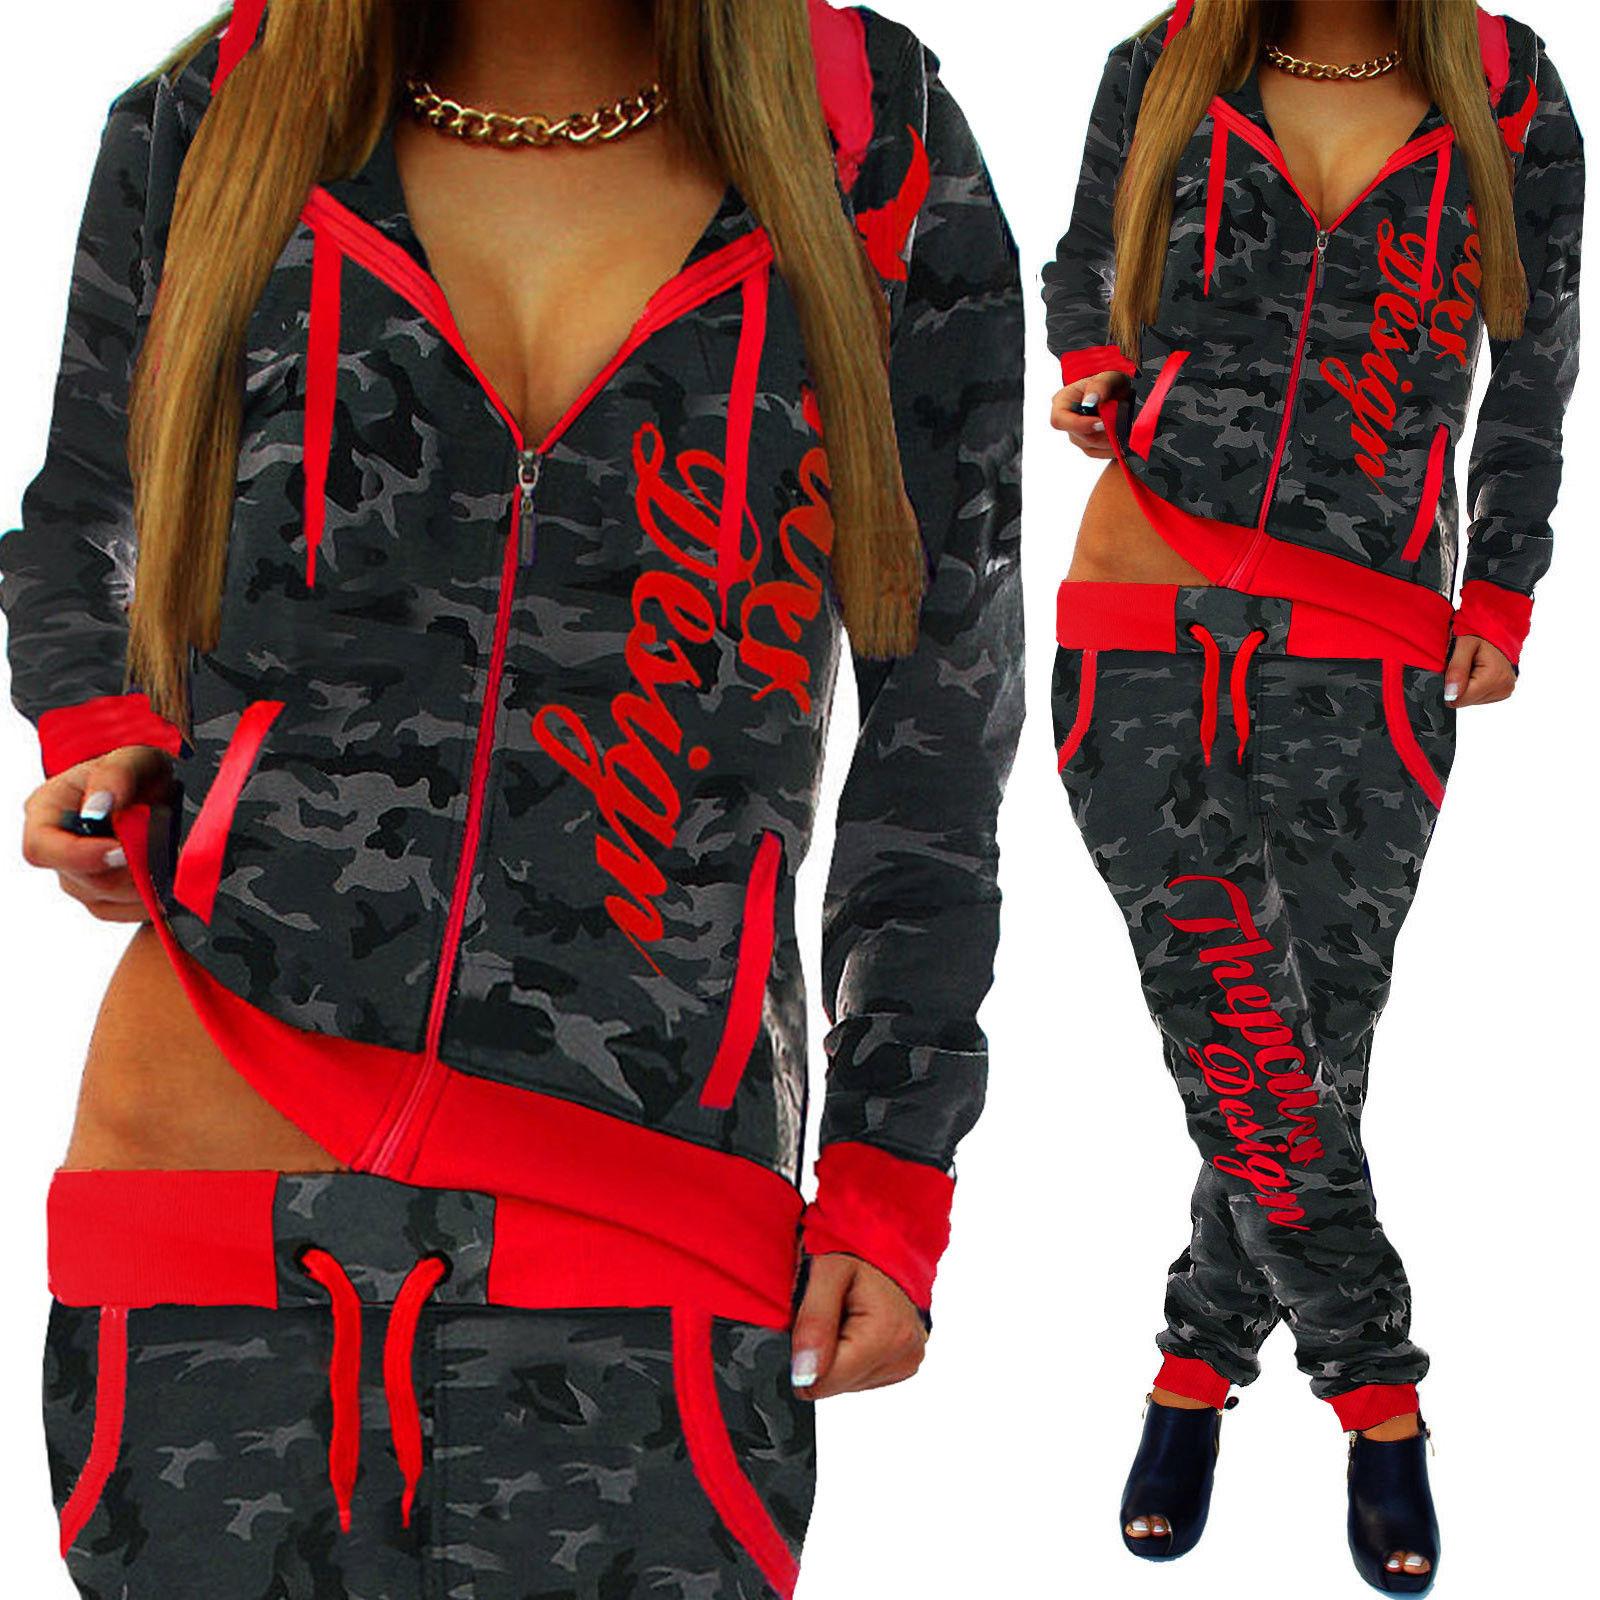 ZOGAA 2018 new  2 piece set women   fashion clothing women 2018 Casual camouflage street style  sweatsuits for women S-3XL